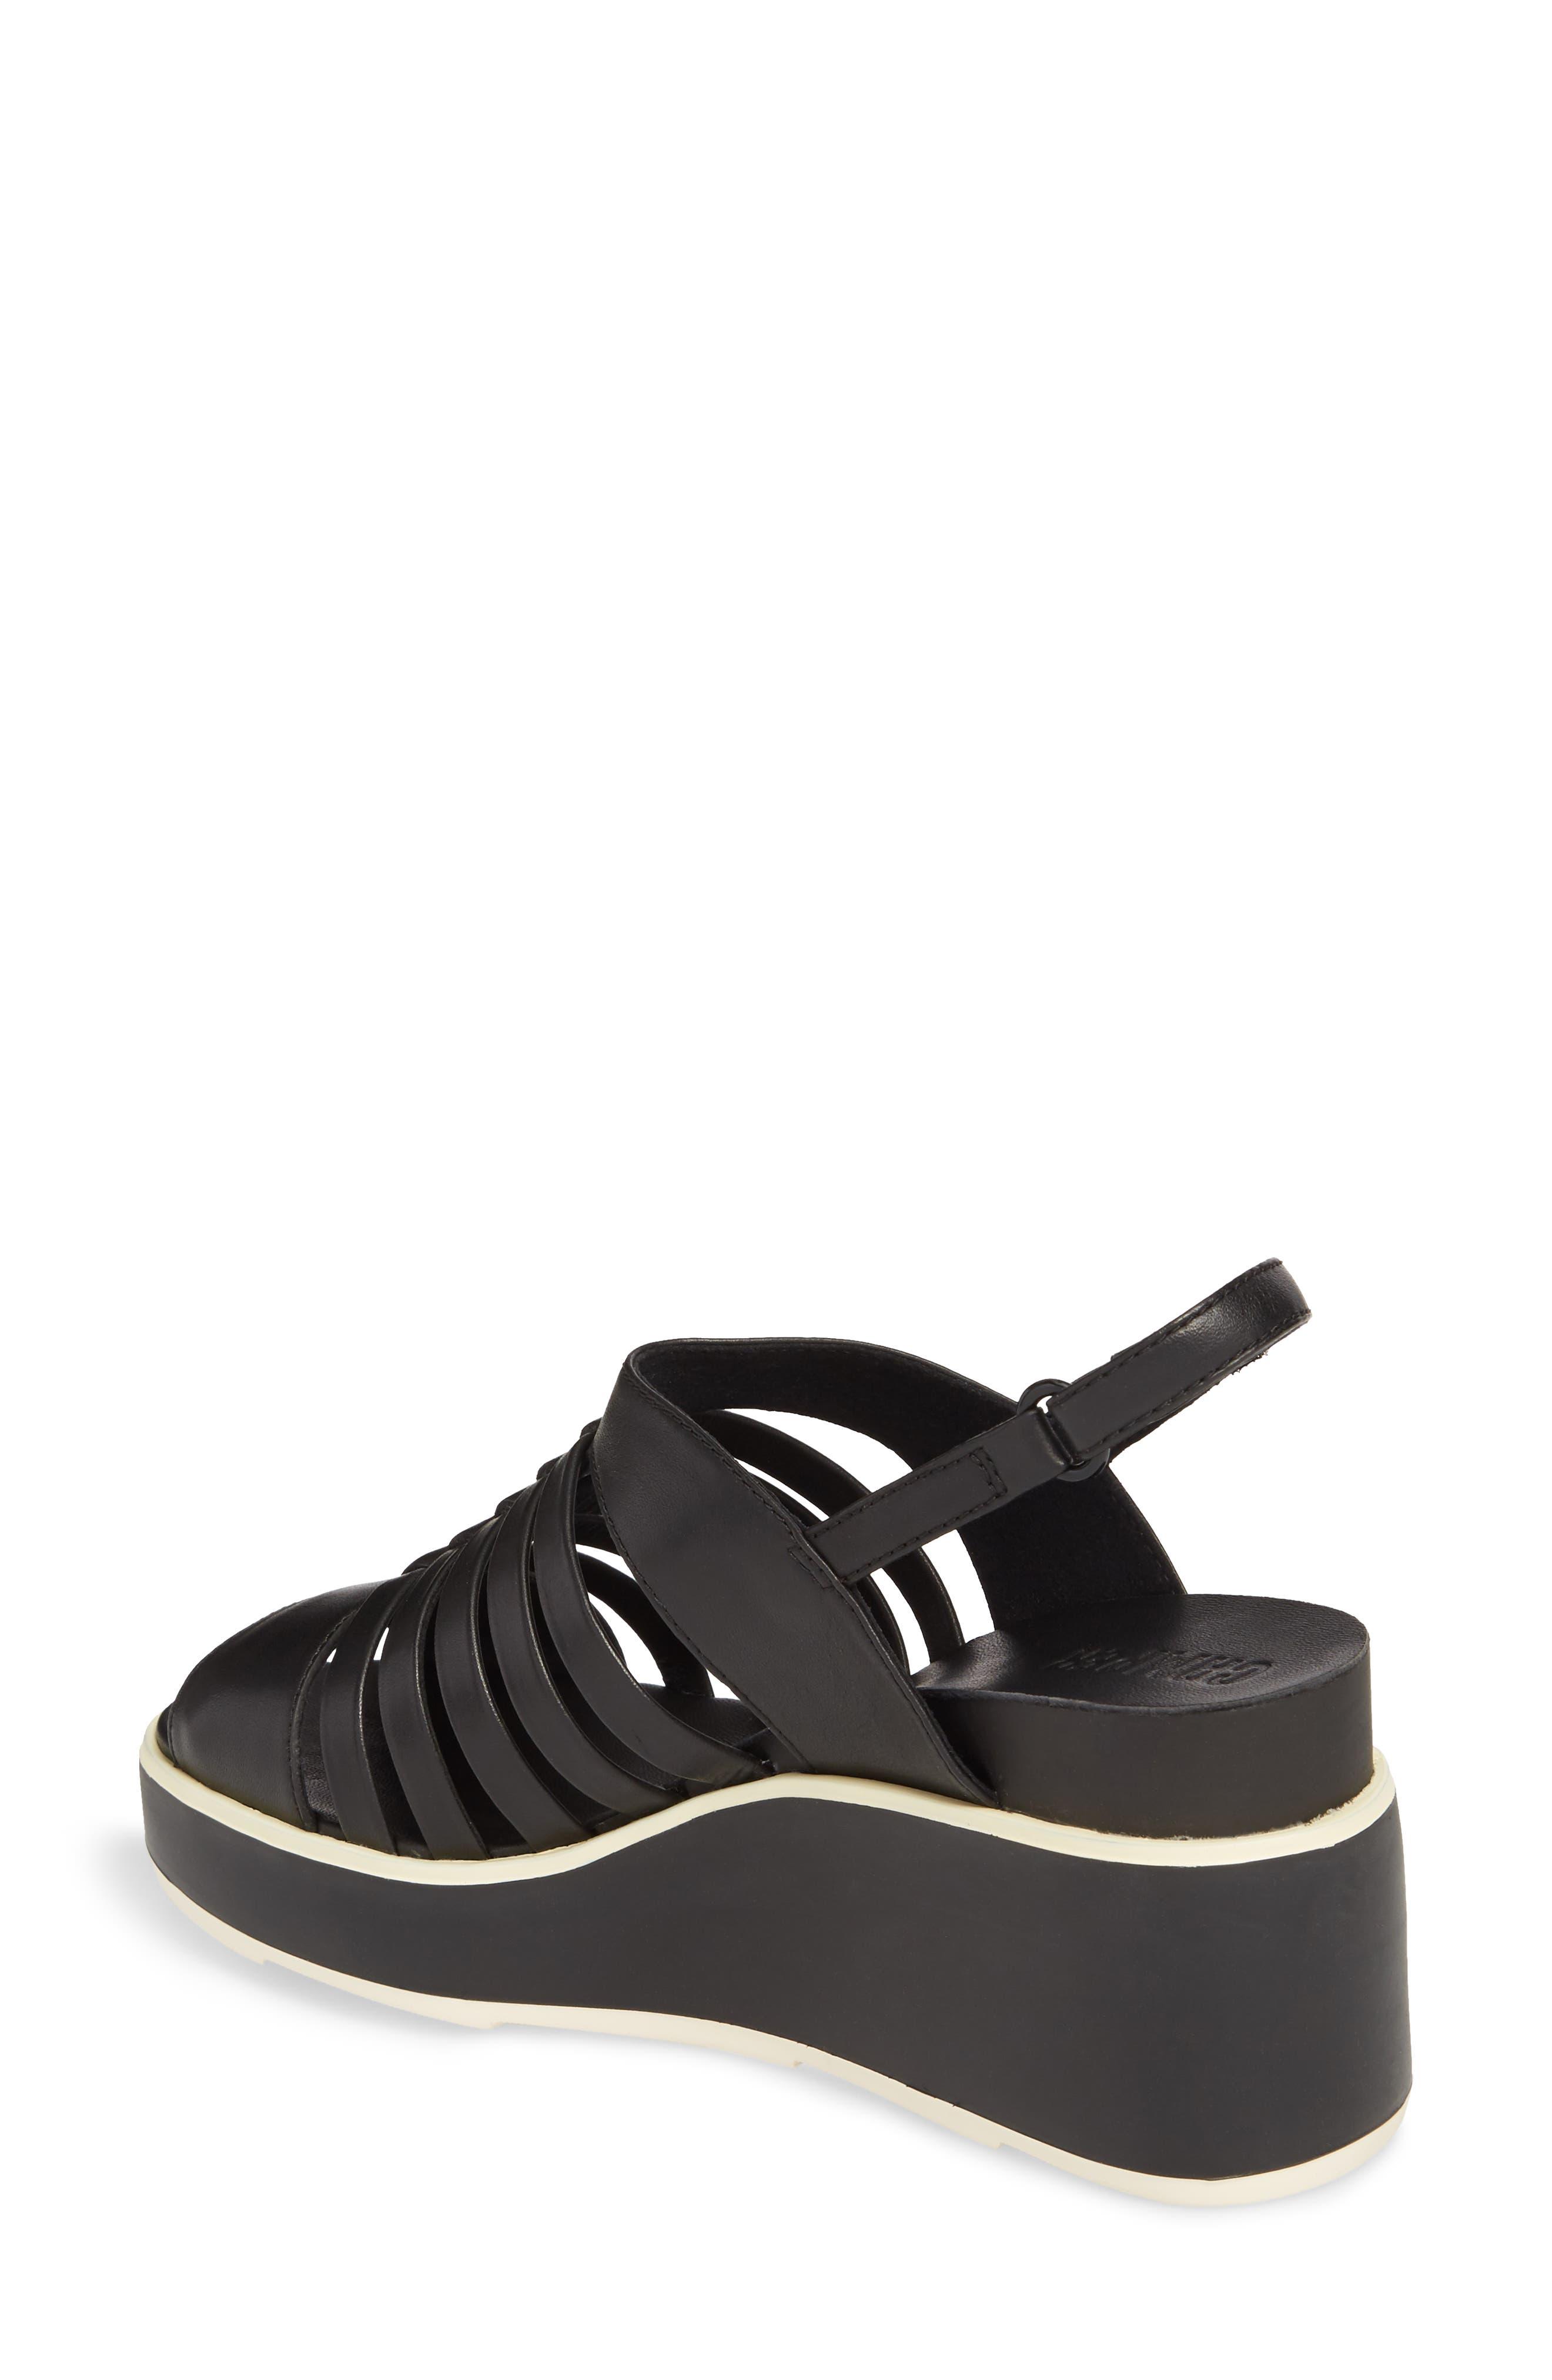 Tropik Strappy Wedge Sandal,                             Alternate thumbnail 2, color,                             Black Leather